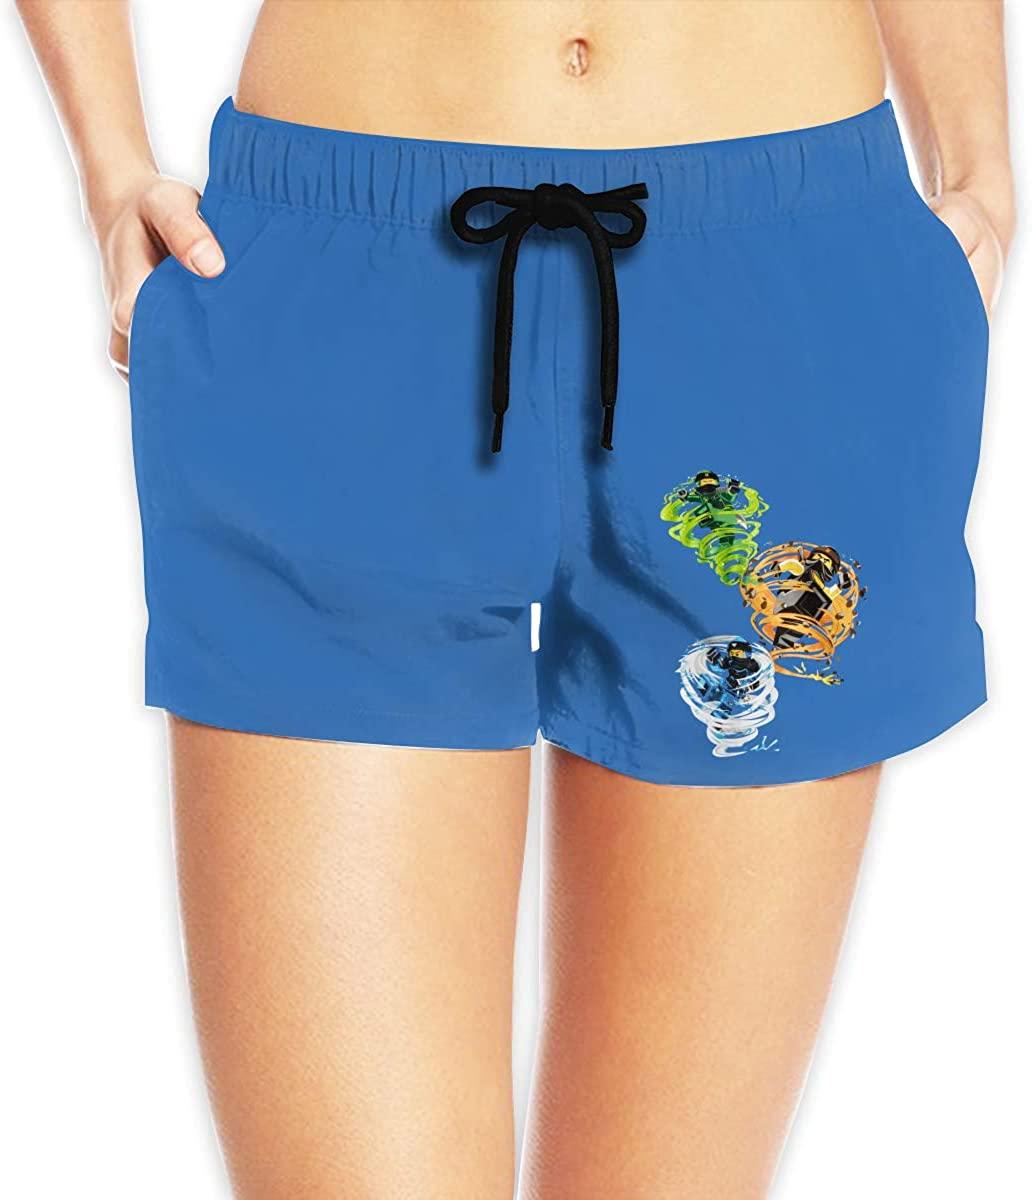 Hangquq Ladiesninjago Printed Bouquet with Waist Beach Shorts.